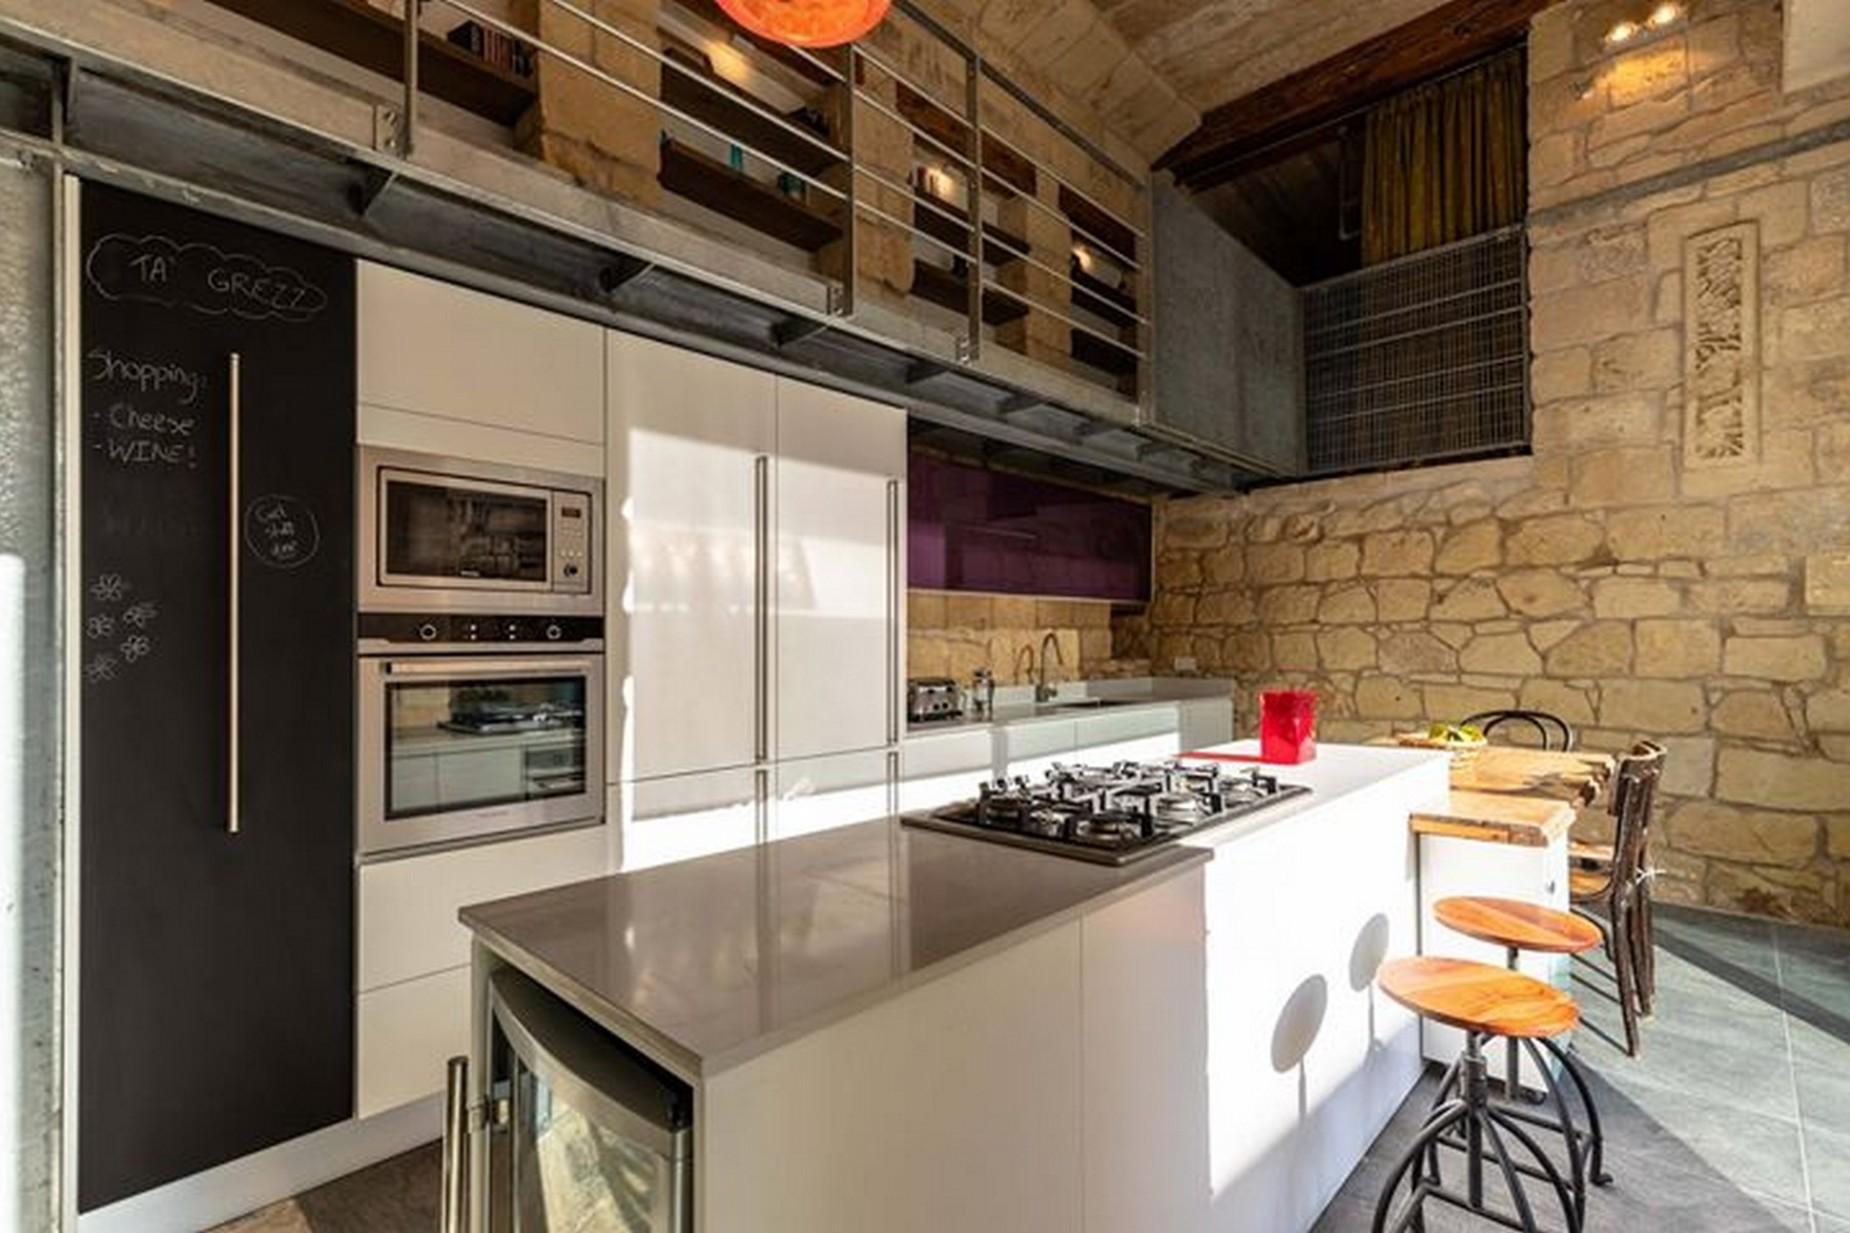 5 bed Villa For Rent in Gharghur, Gharghur - thumb 12